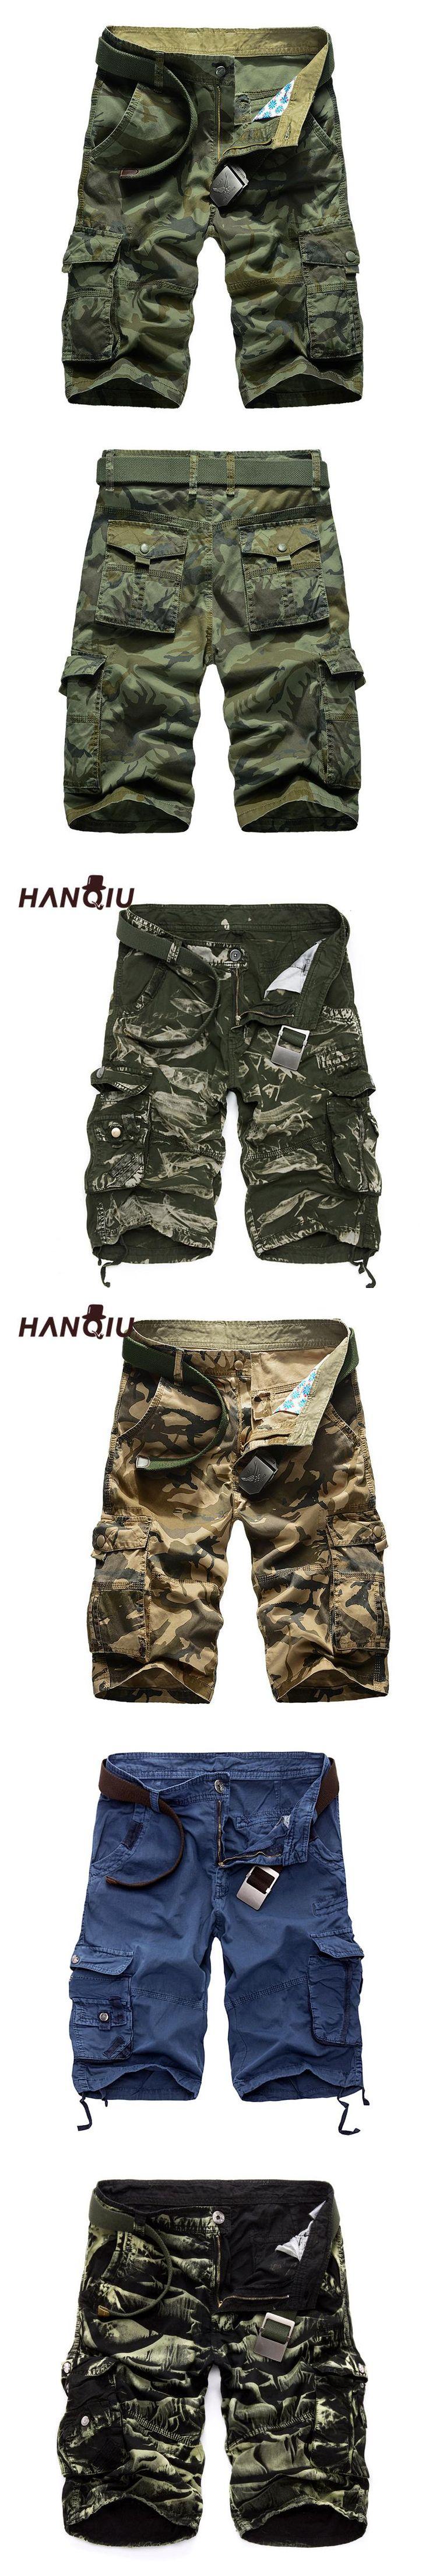 HANQIU Cargo Shorts Men 2017 Summer Casual Loose Camouflage Male Fashion Army Camo Work Shorts Plus Size 29-44